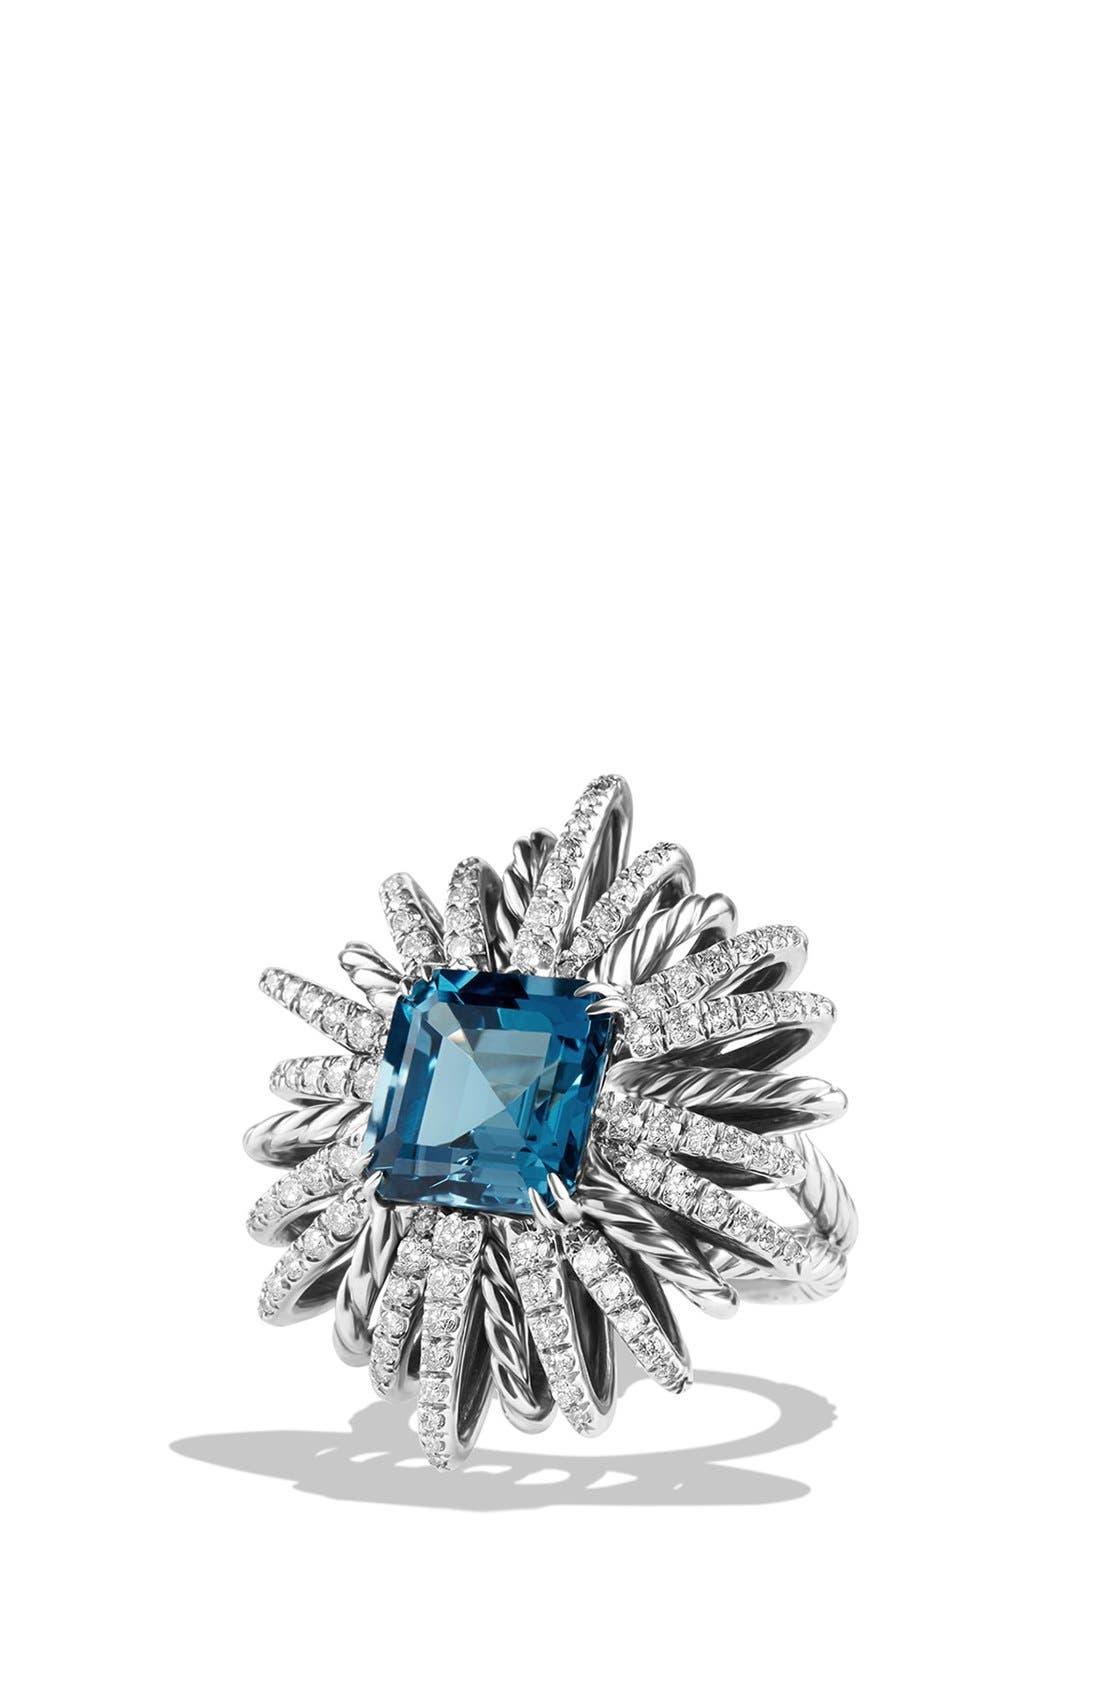 'Starburst' Ring with Semiprecious Stone and Diamonds,                             Main thumbnail 1, color,                             Hampton Blue Topaz